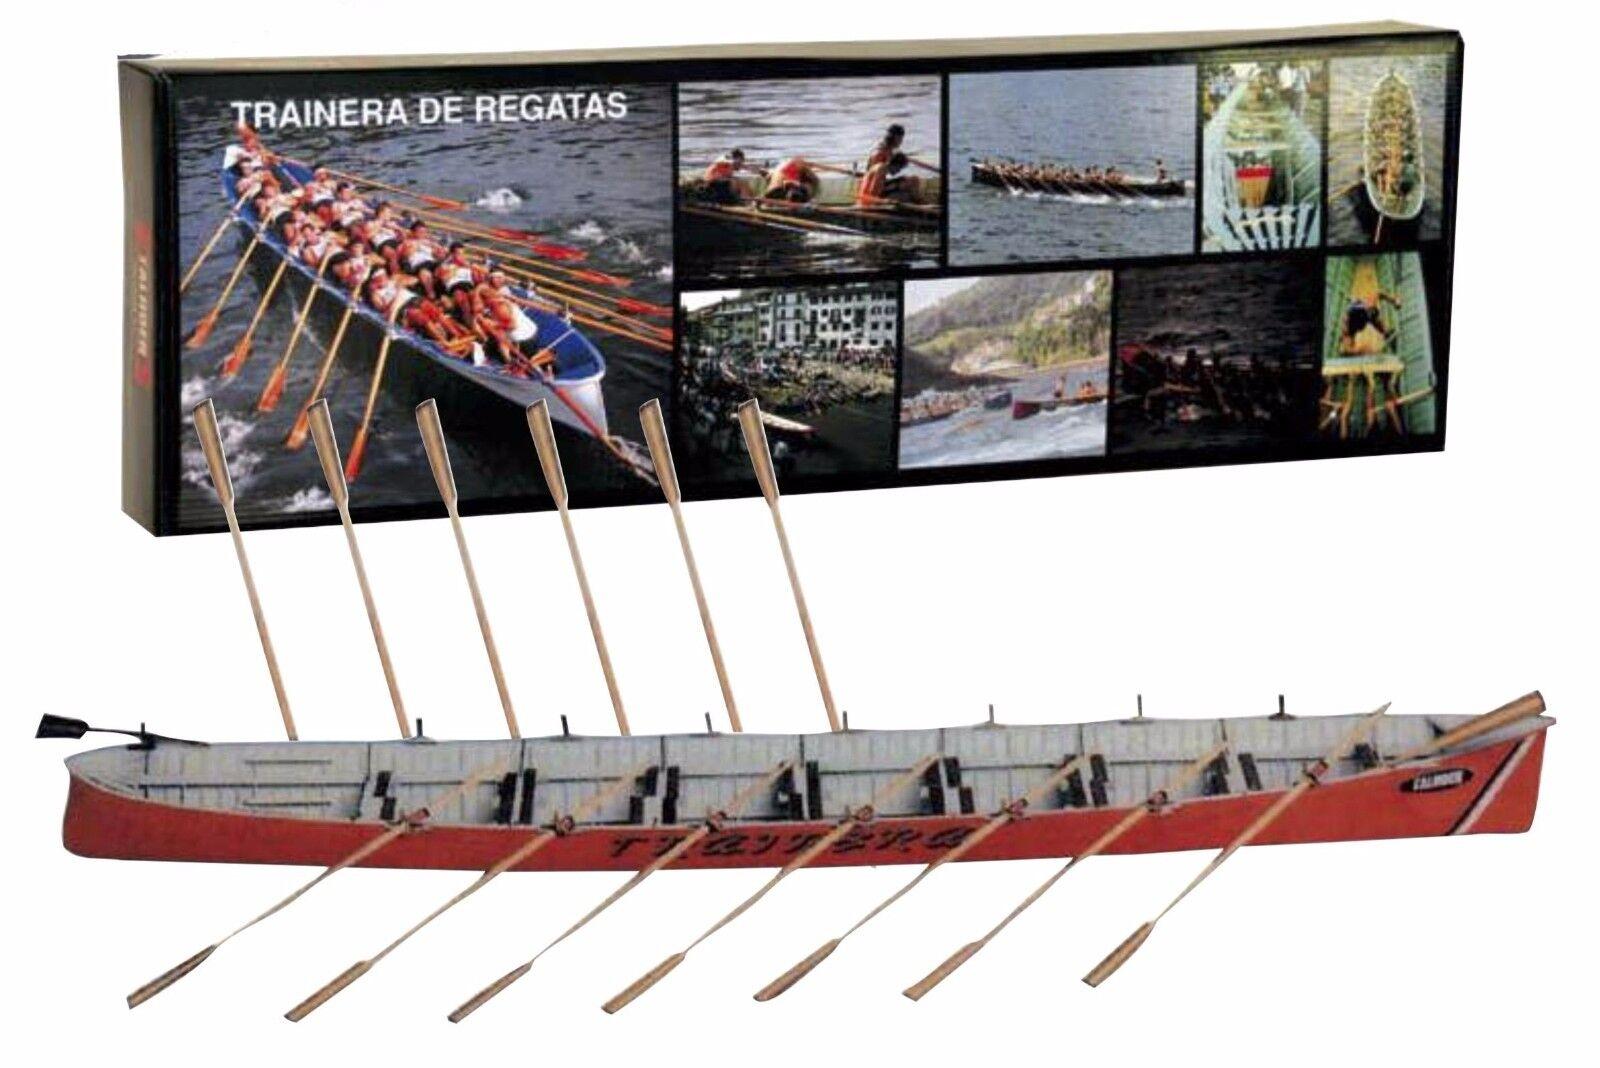 Unique, New Wooden Model Ship Kit by Disar  the  Trainera De Regatas